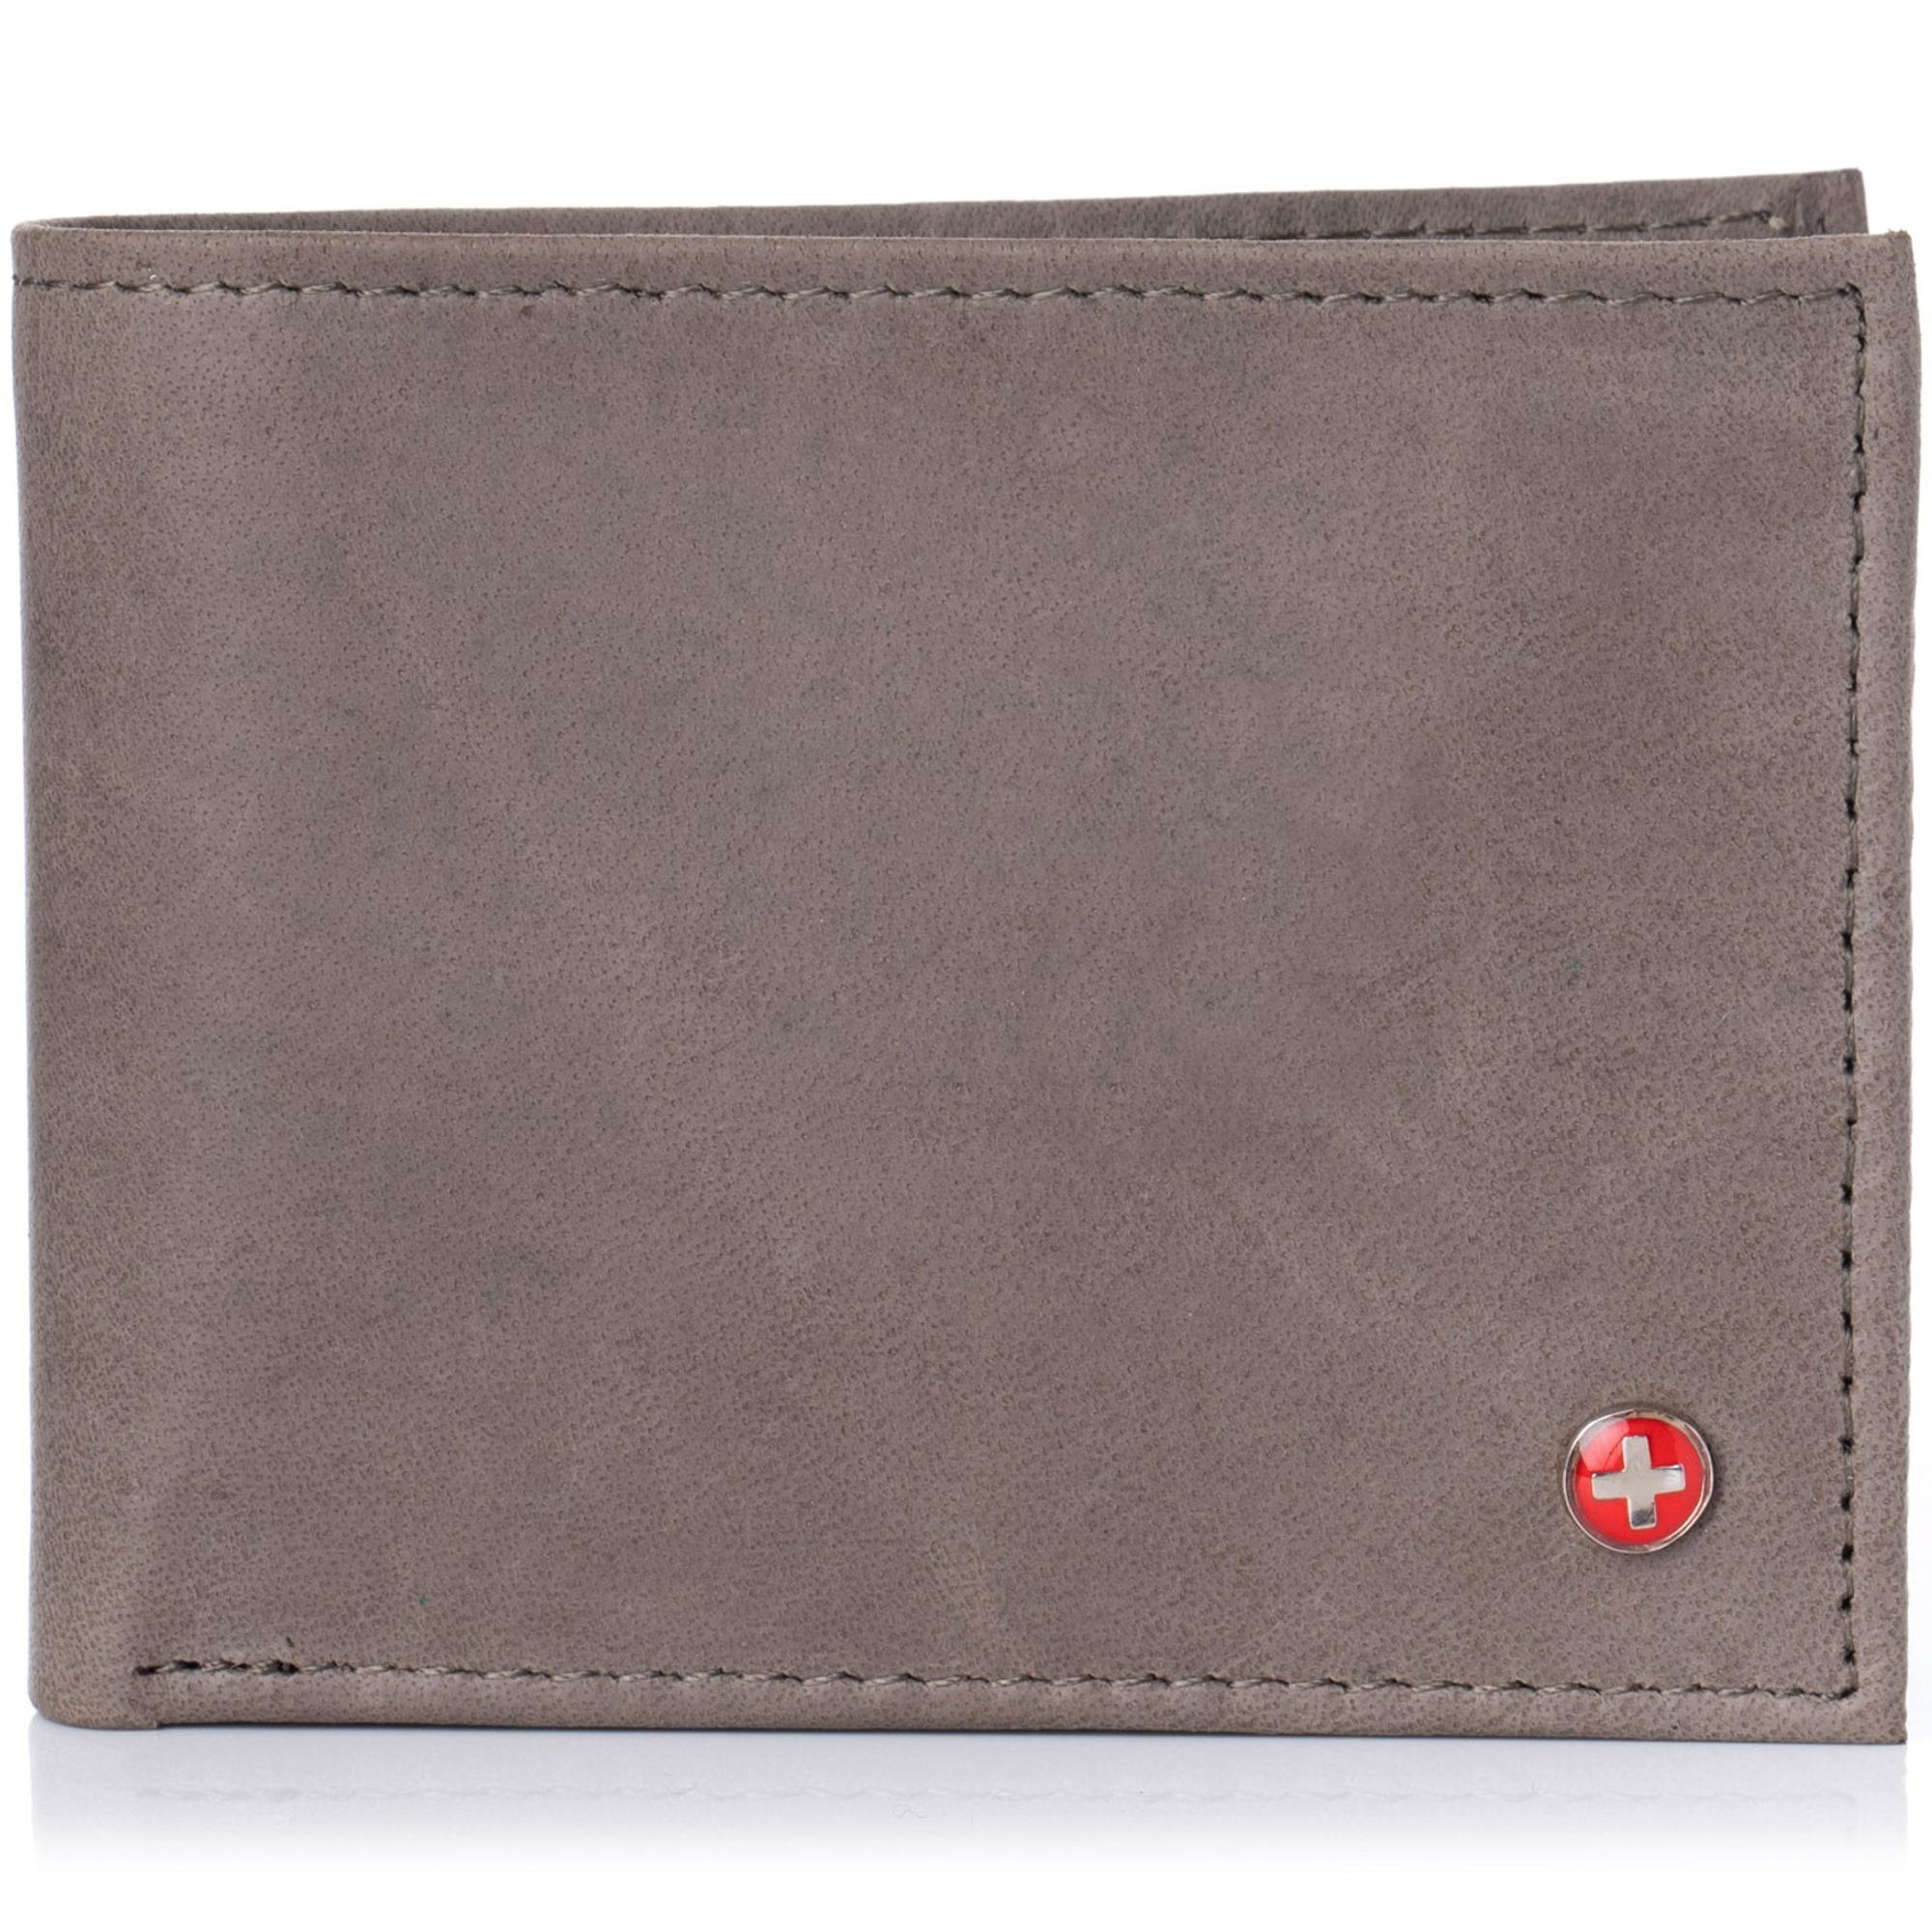 Alpine-Swiss-Mens-RFID-Blocking-Leather-Wallet-Multi-Card-High-Capacity-Bifold thumbnail 36